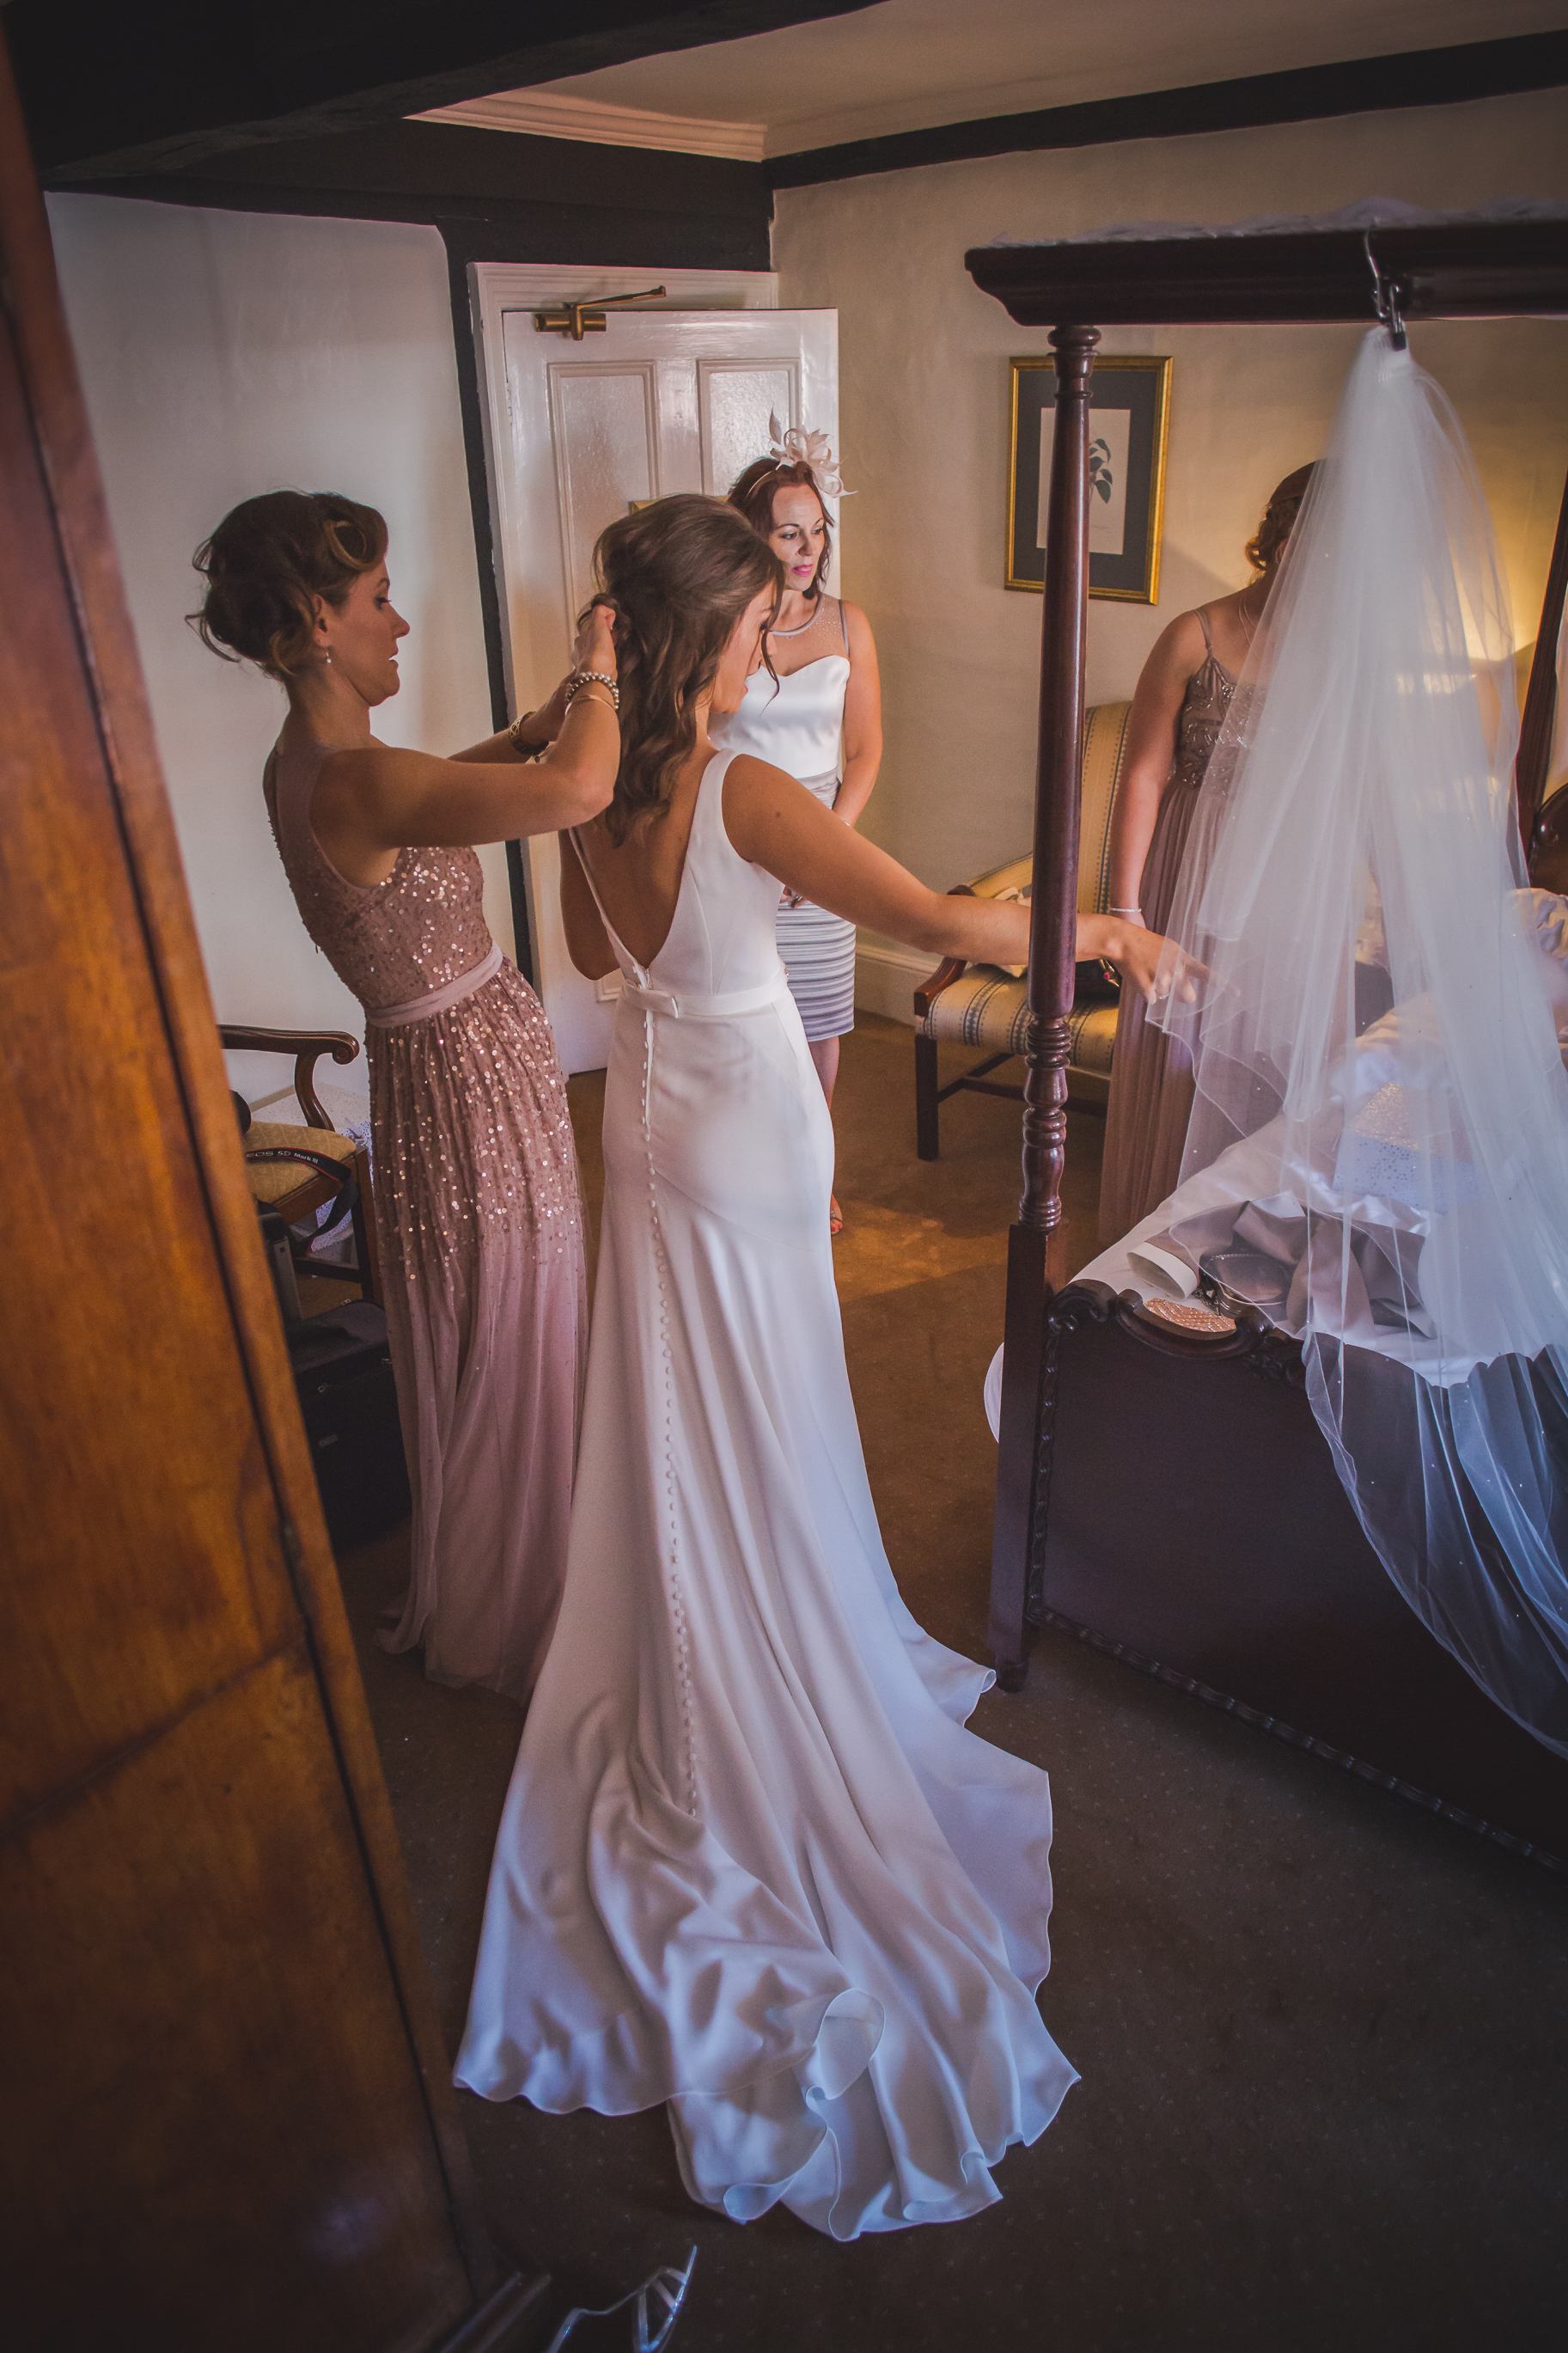 Grittenham Barn female wedding photographers west sussex petworth social-13.jpg